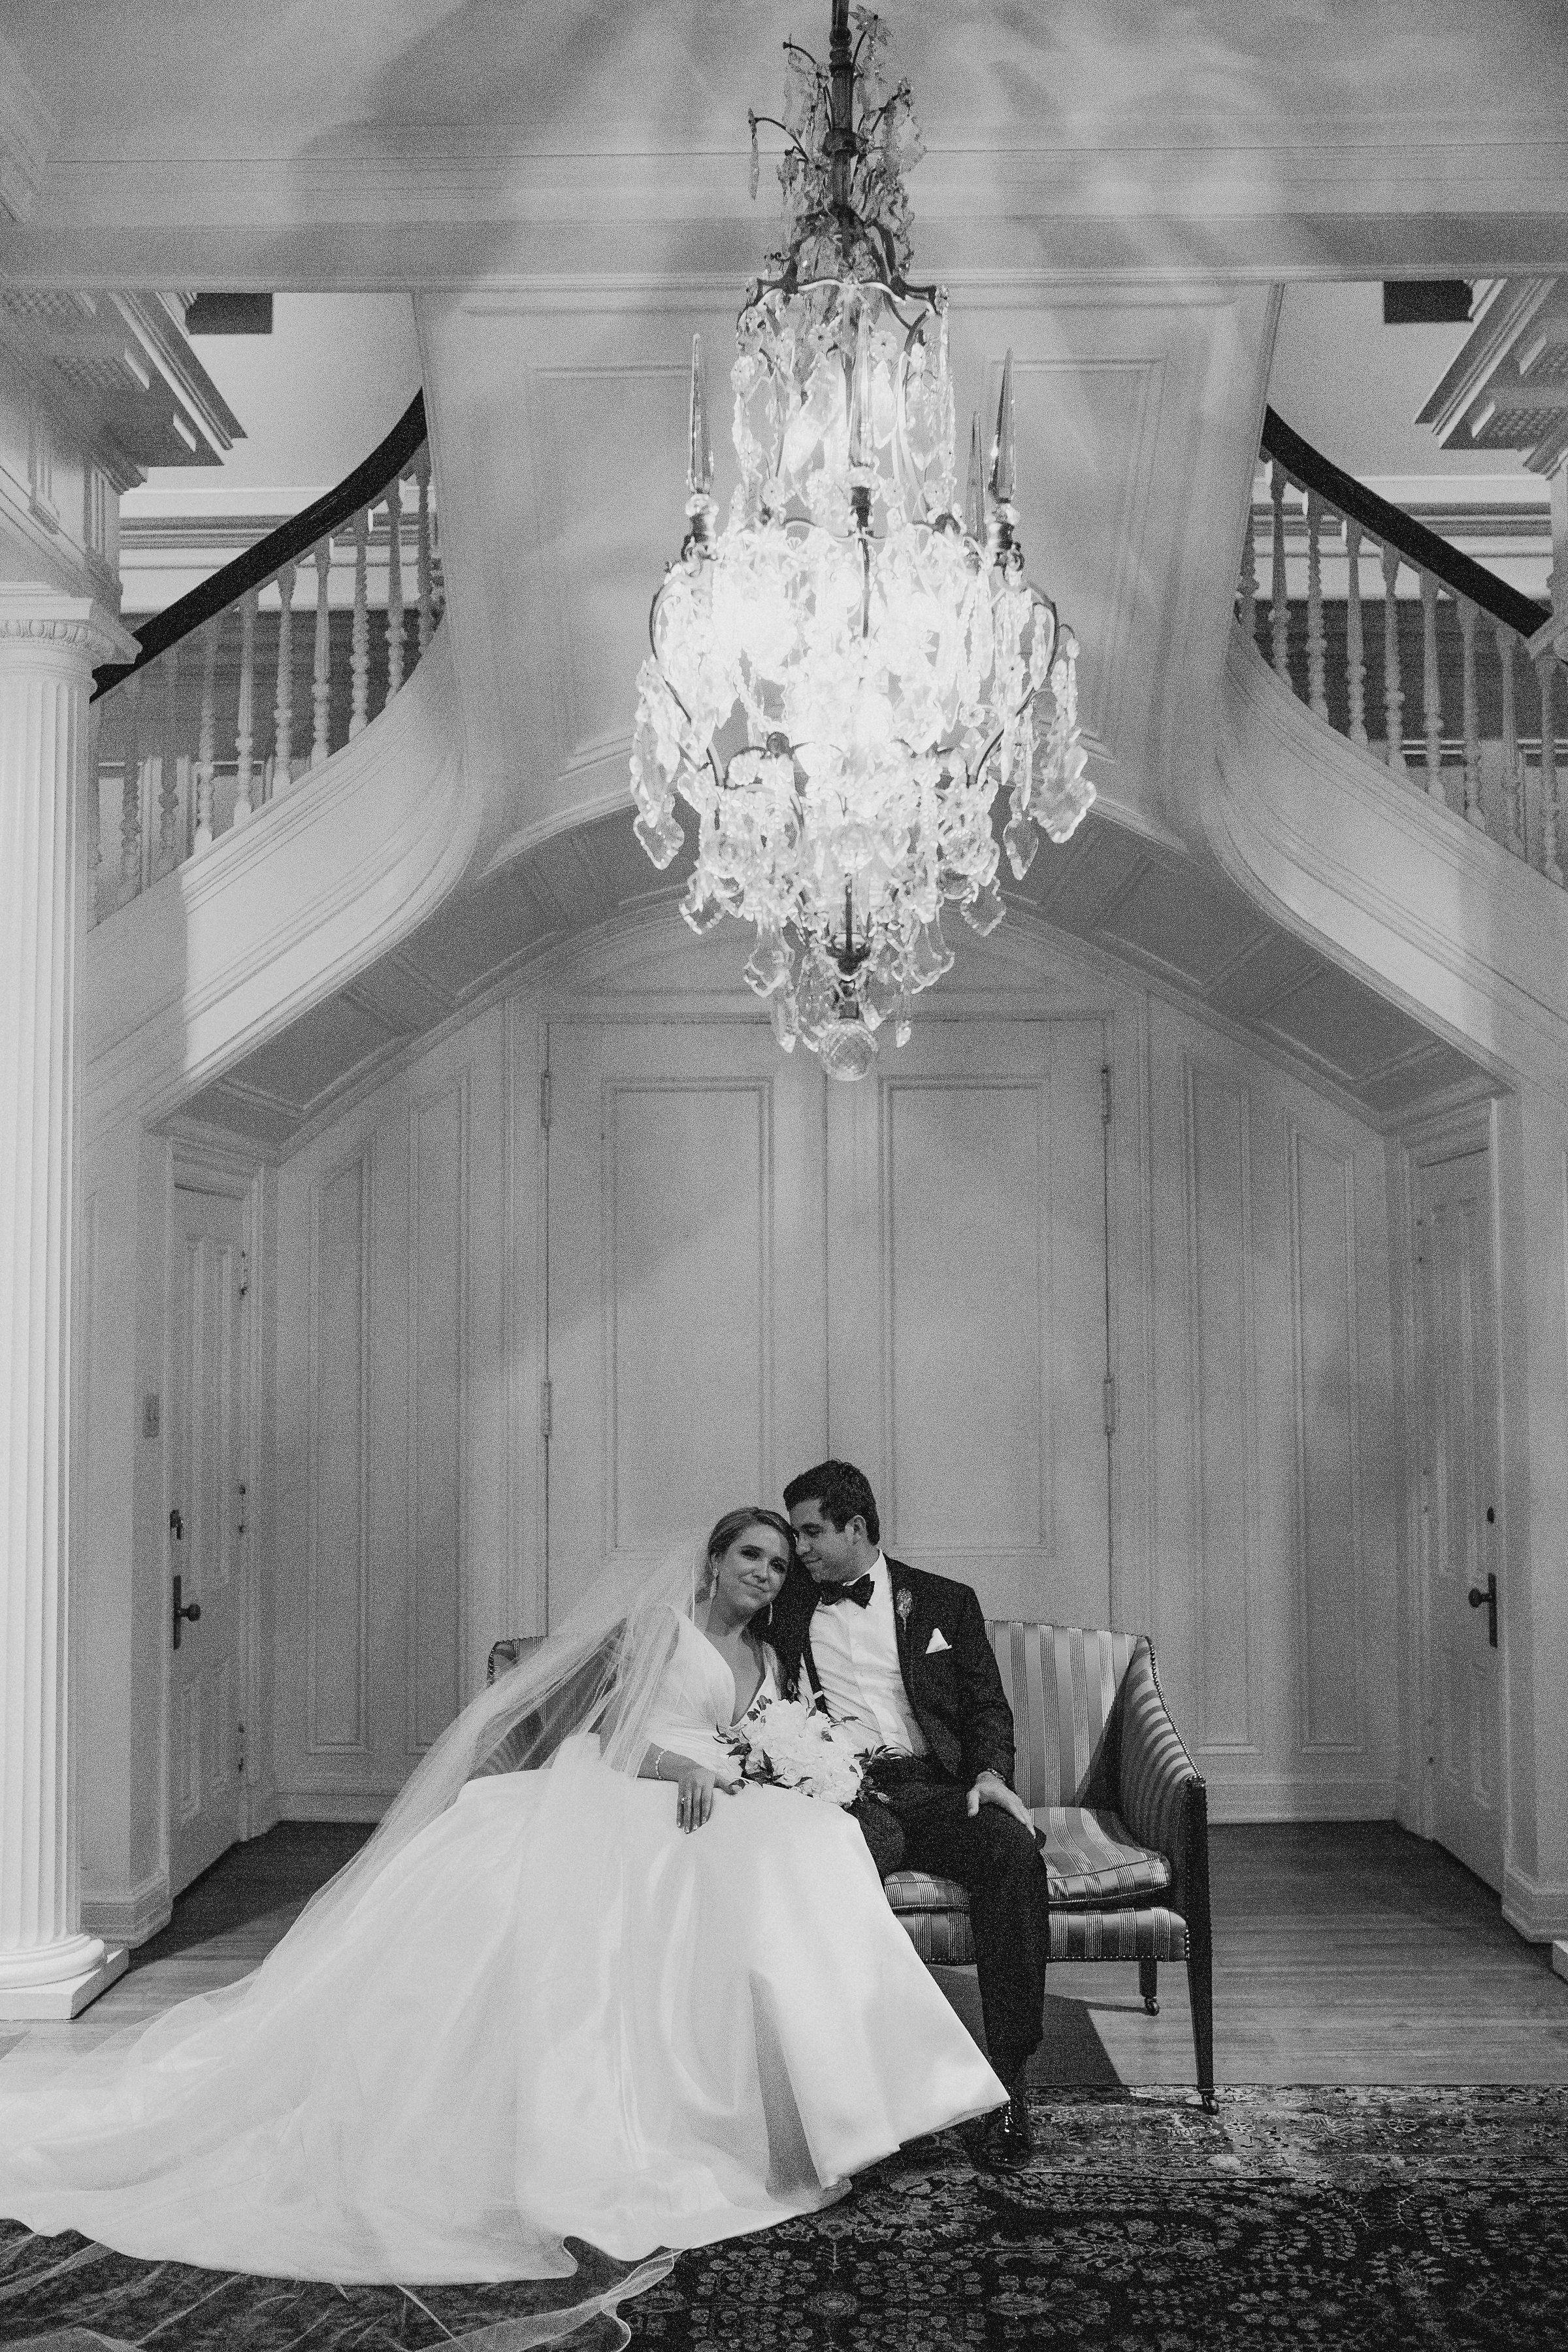 Black and white wedding photo wedding photos hunter museum